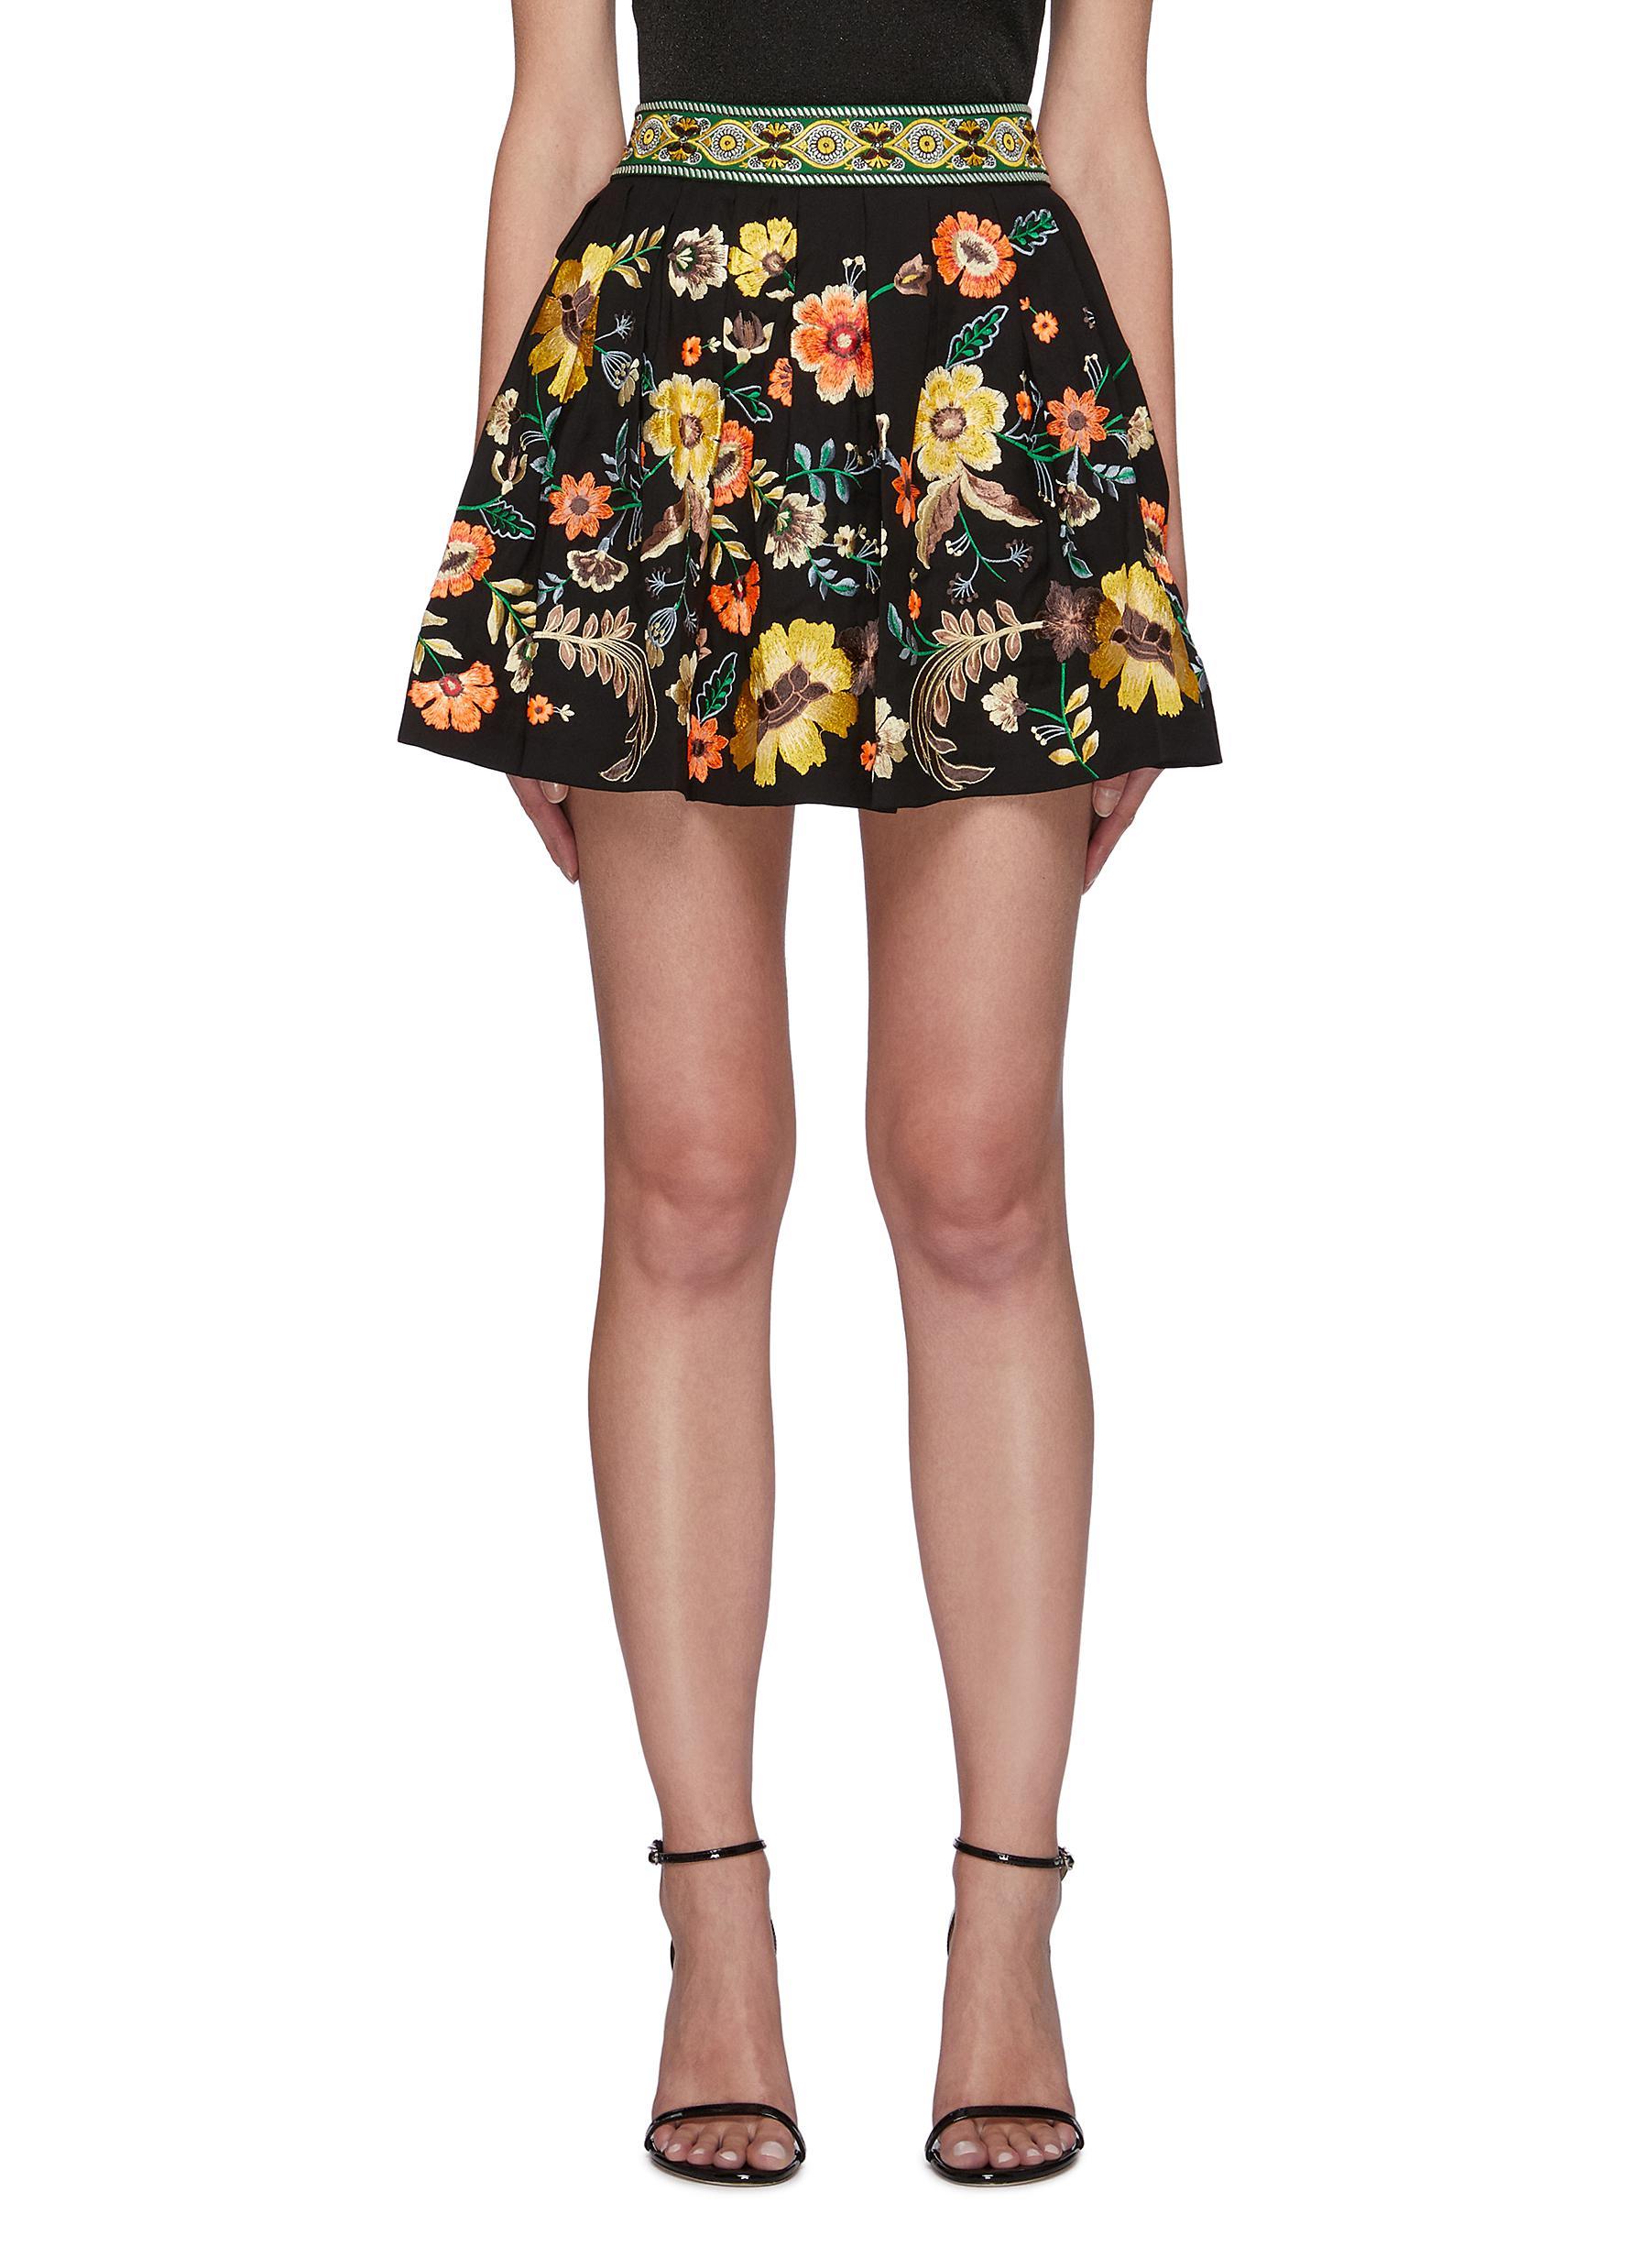 Fizer' Jacquard Waistband Floral Embroidered Mini Skirt - ALICE + OLIVIA - Modalova